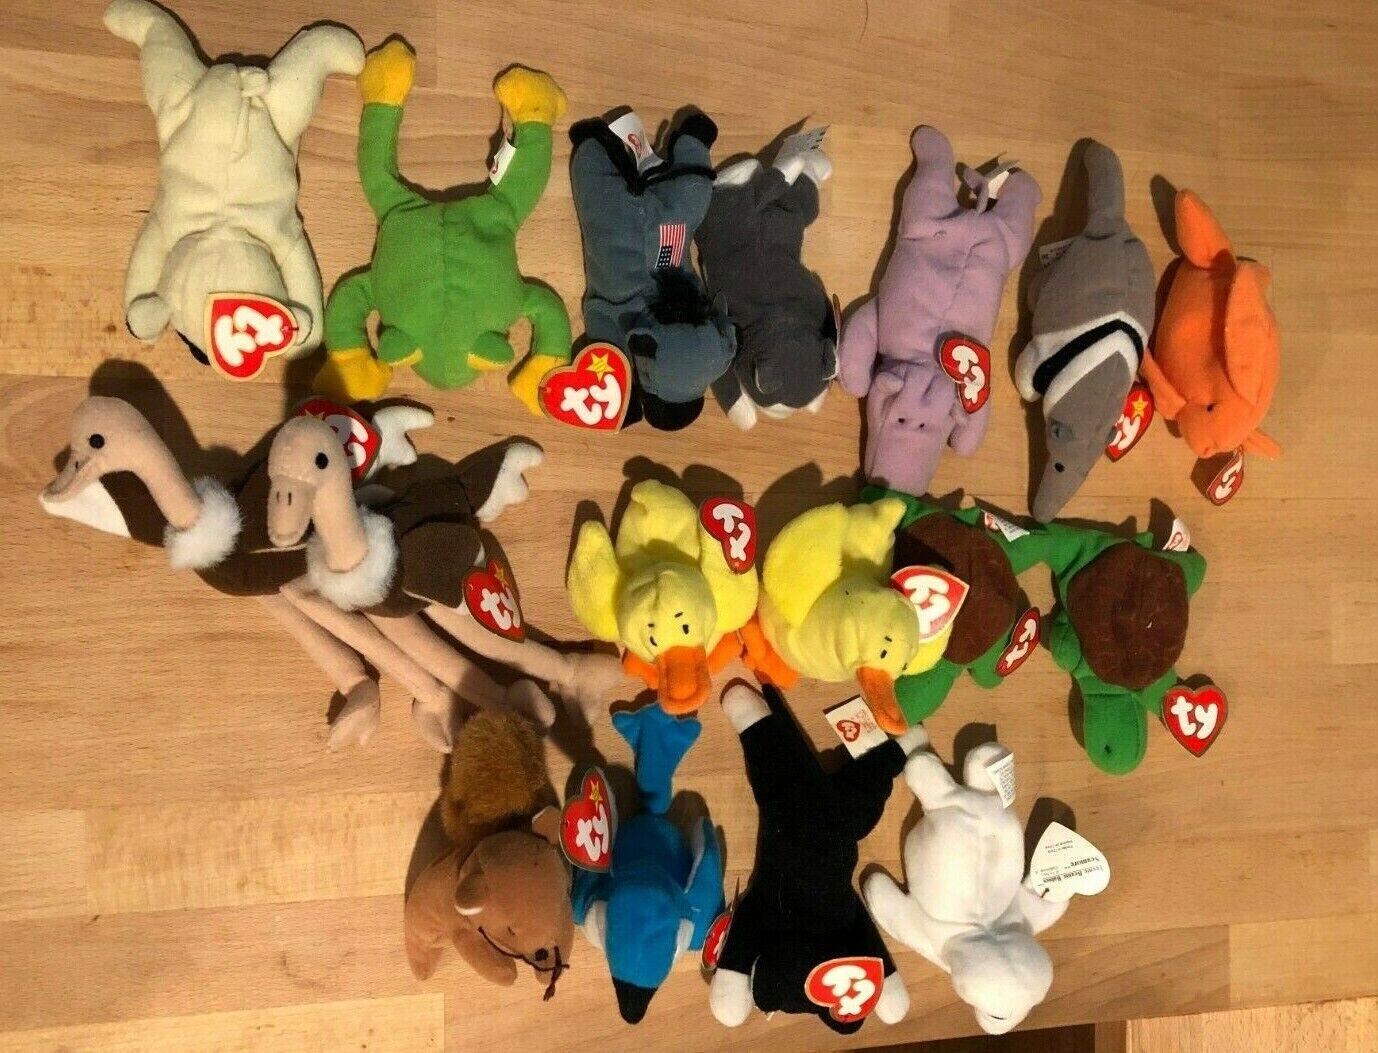 NEW 1996-1999 1996-1999 1996-1999 Teenie Beanie Babies set of 17 55e760